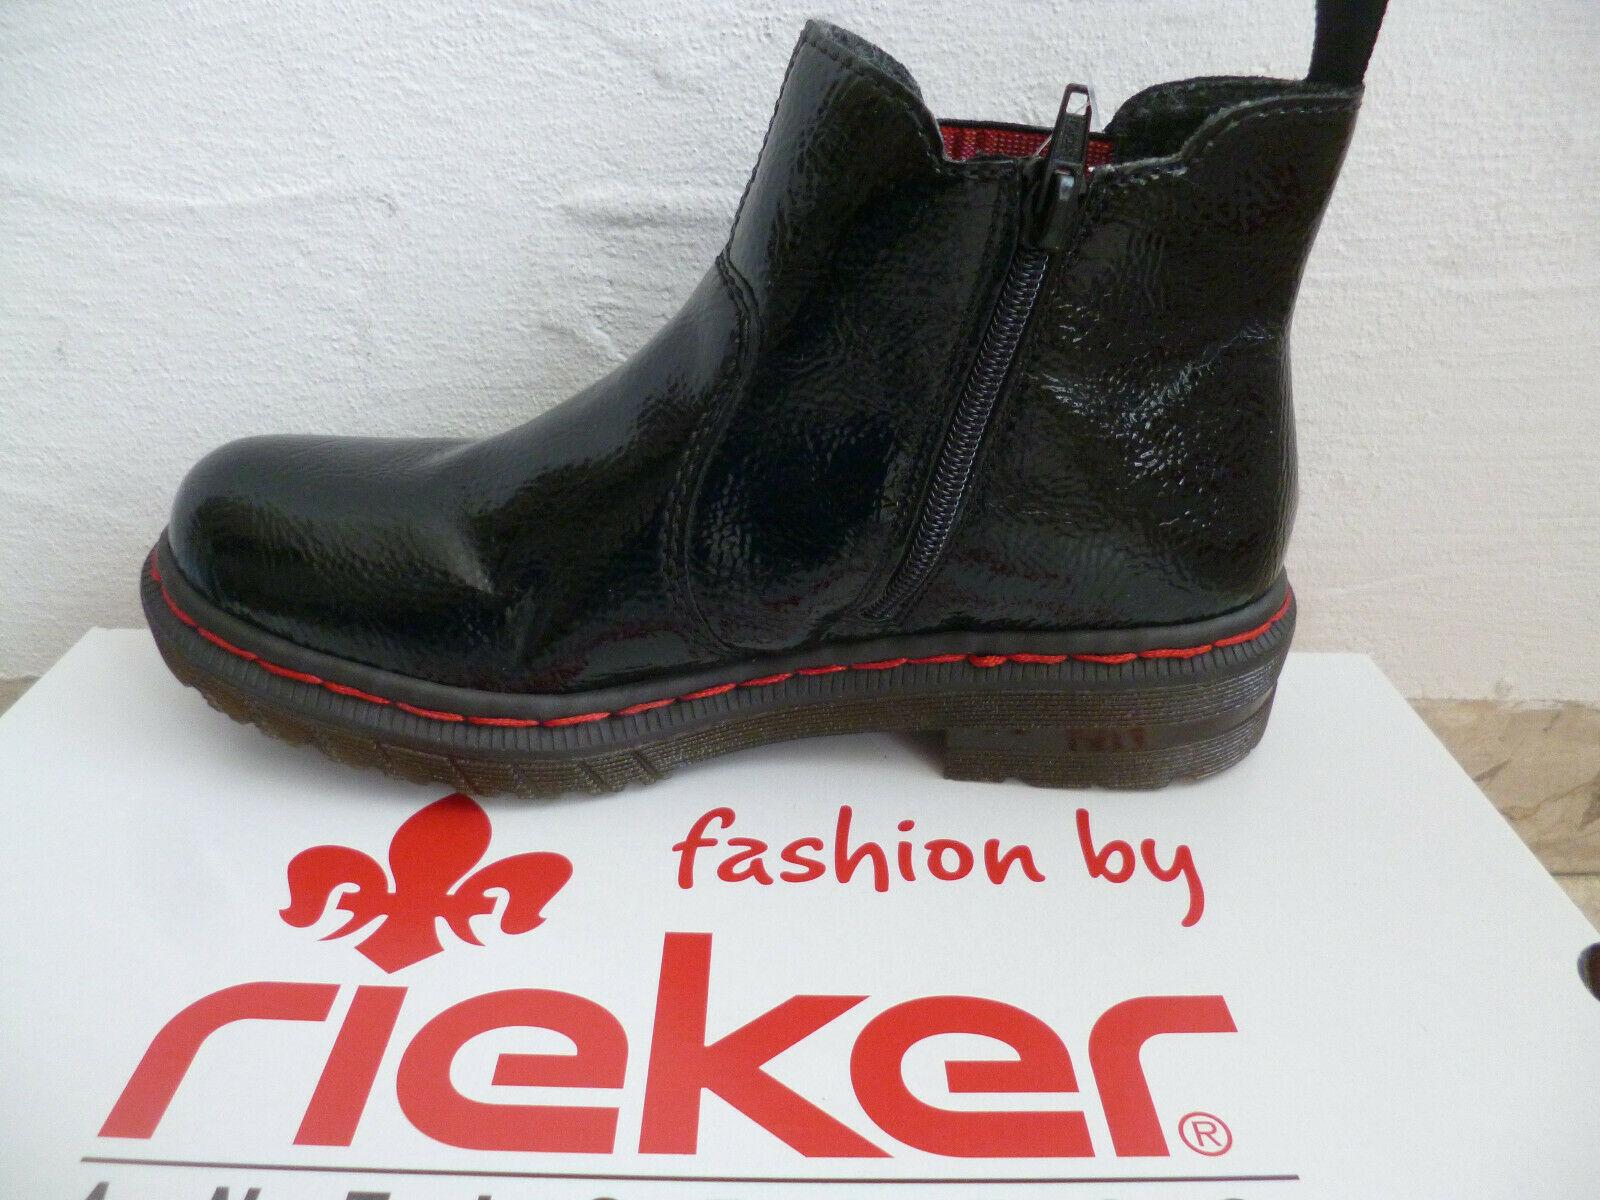 NEU Rieker Damenschuhe Schuhe Stiefeletten Boots Stiefel Damenstiefel Lackoptik